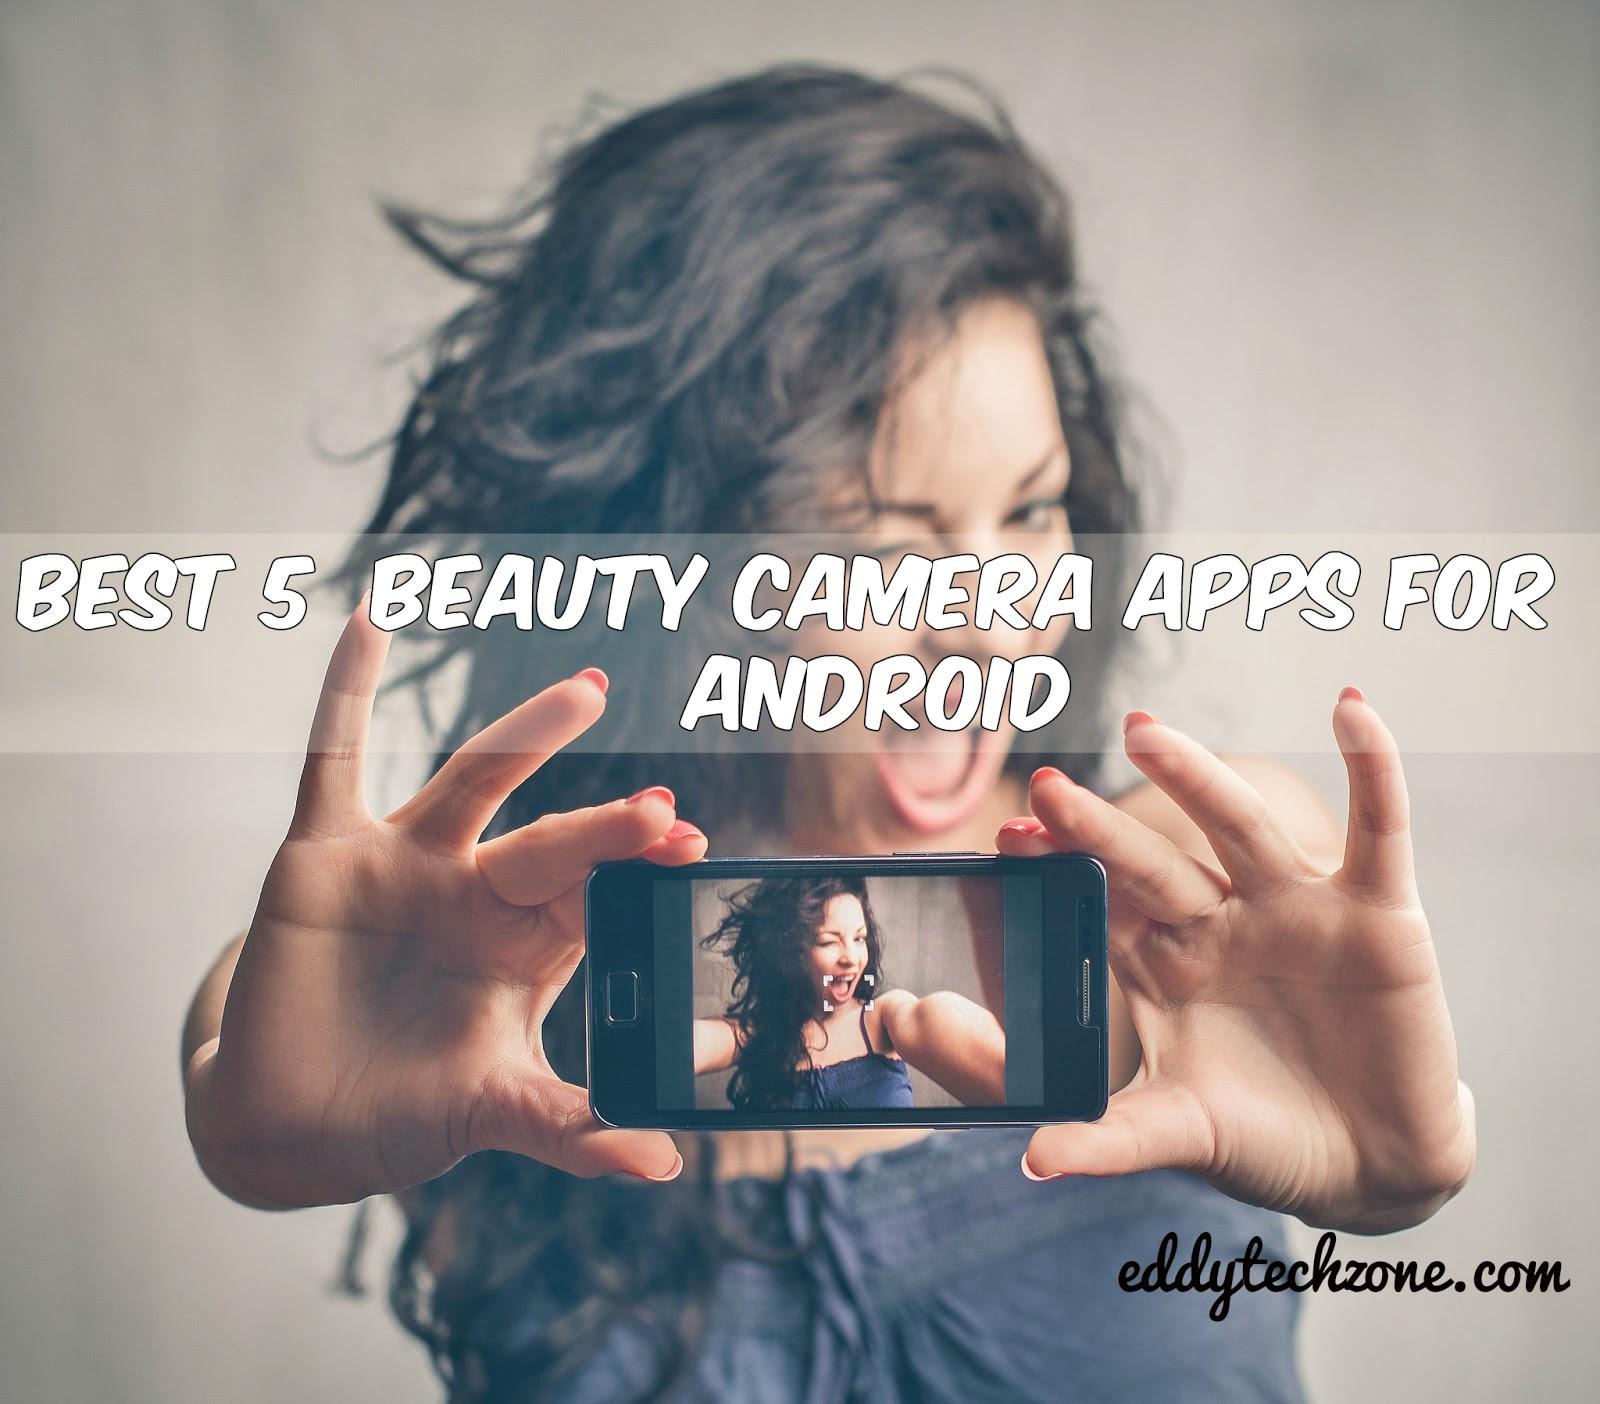 Best 5 selfie camera apps for android - Eddytechz